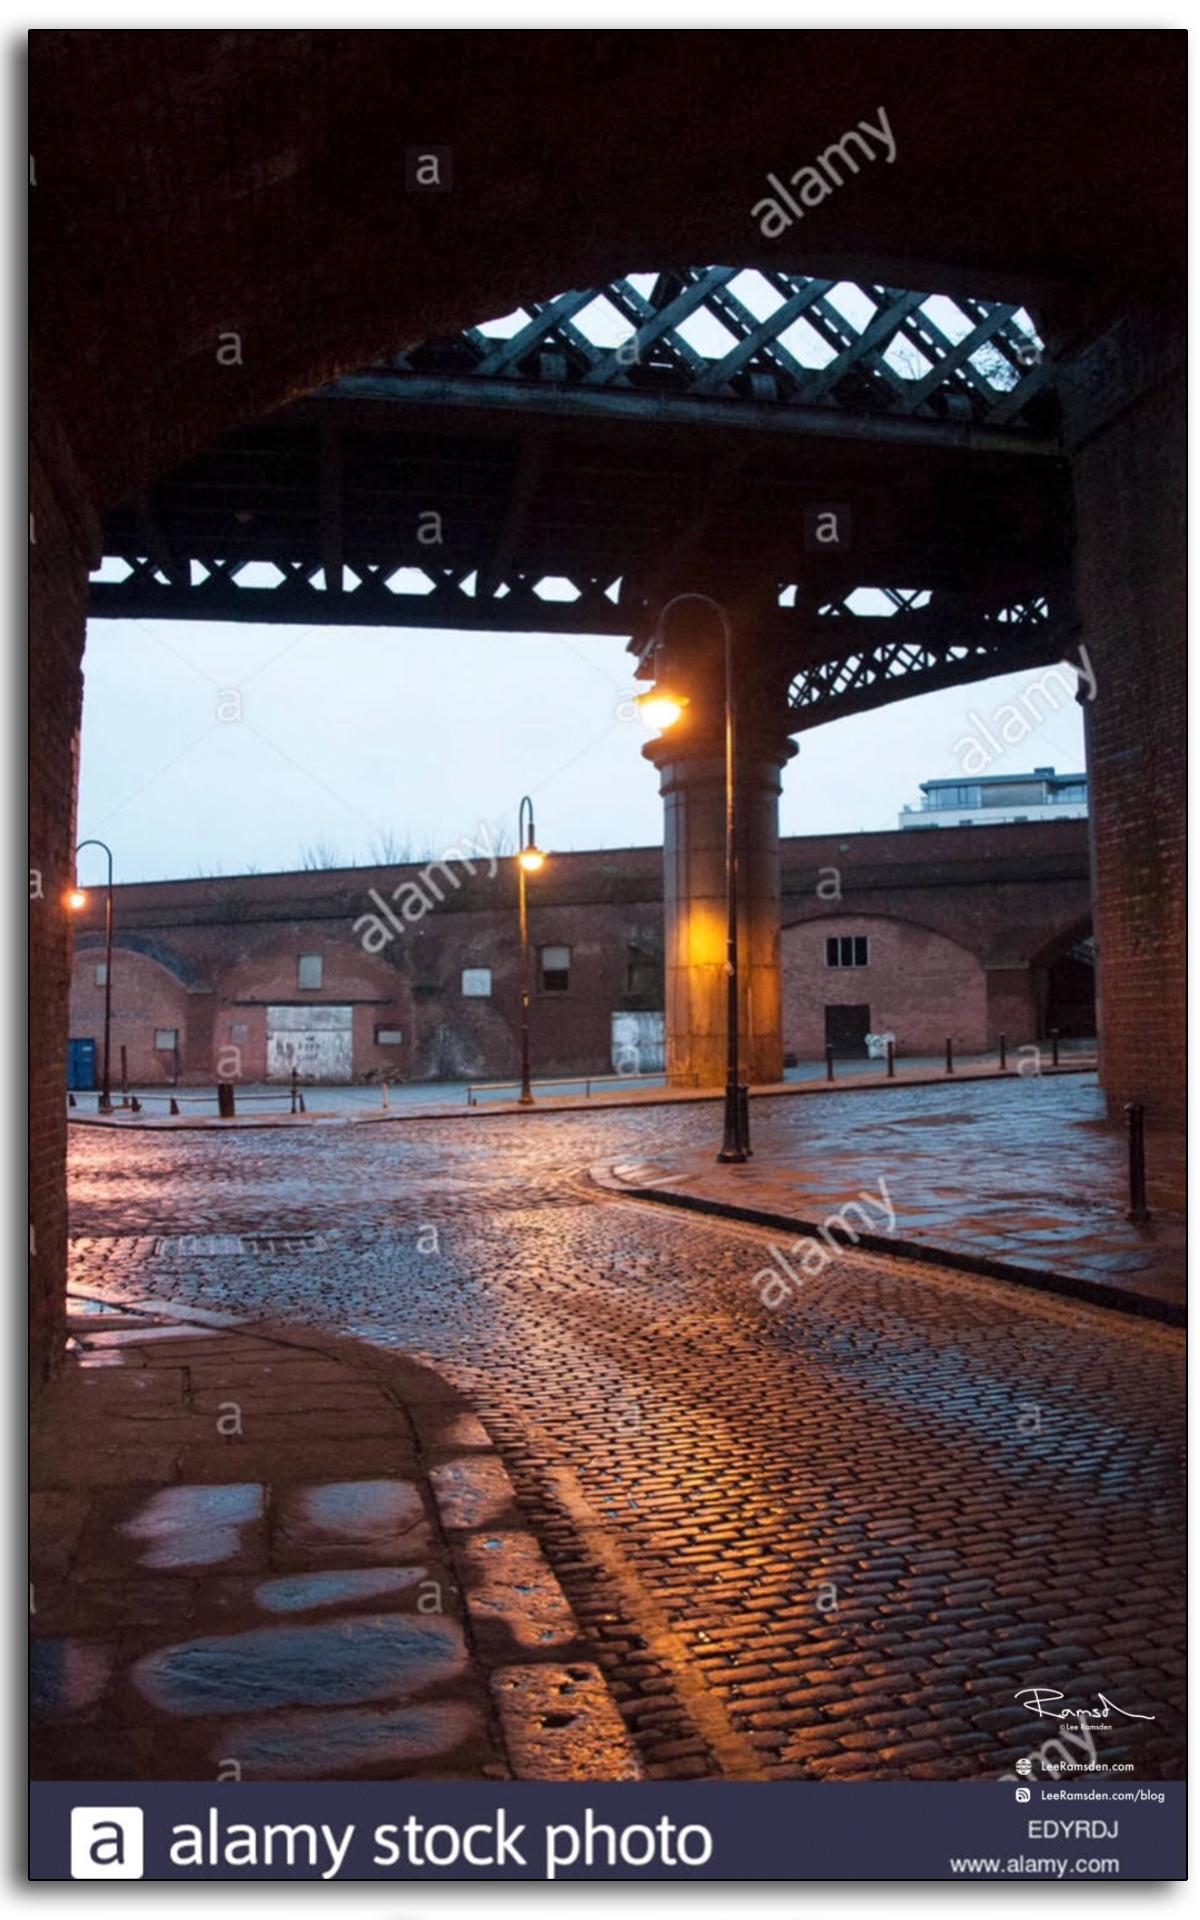 Manchester, castle gardens, Alamy, street, lighting, uk, northwest, commissioned work, book cover, lee ramsden